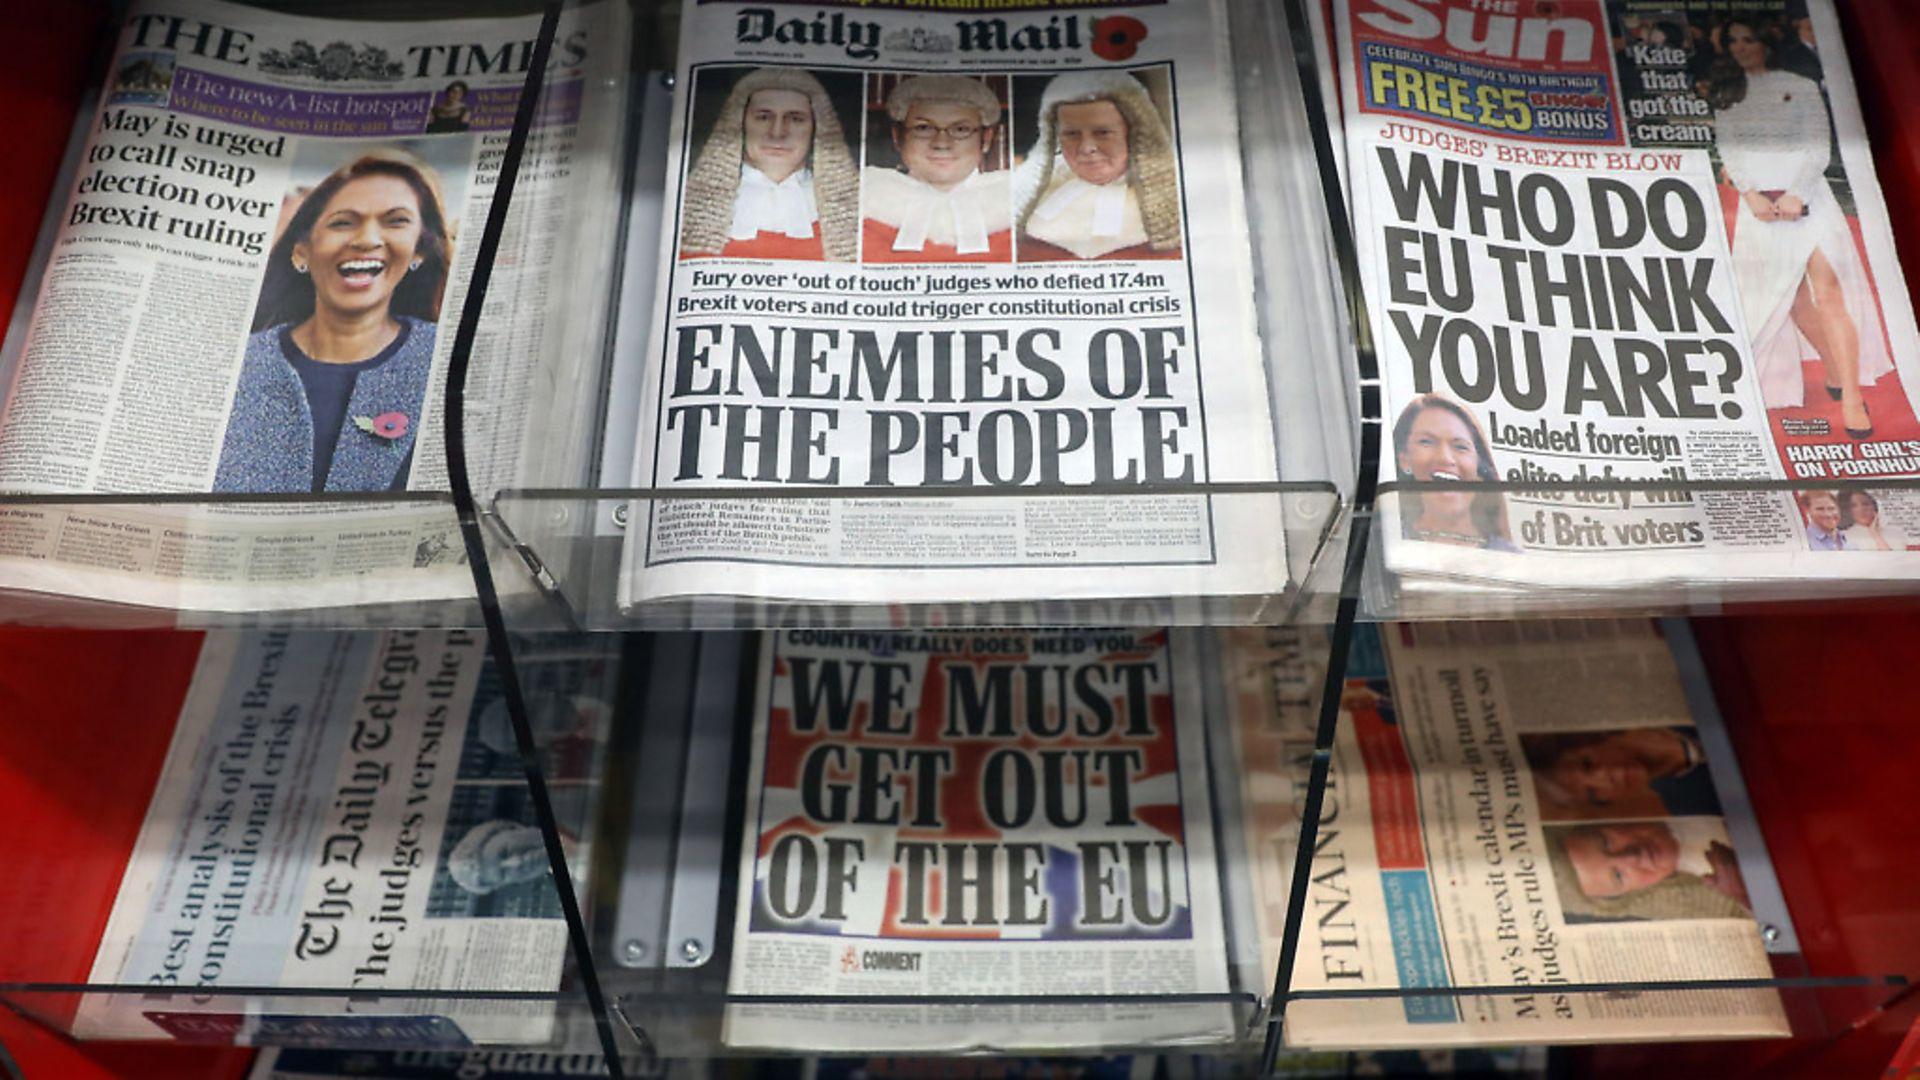 Pro-Brexit national newspapers lambast High Court judges. Photographer: Chris Ratcliffe/Bloomberg via Getty Images - Credit: Bloomberg via Getty Images